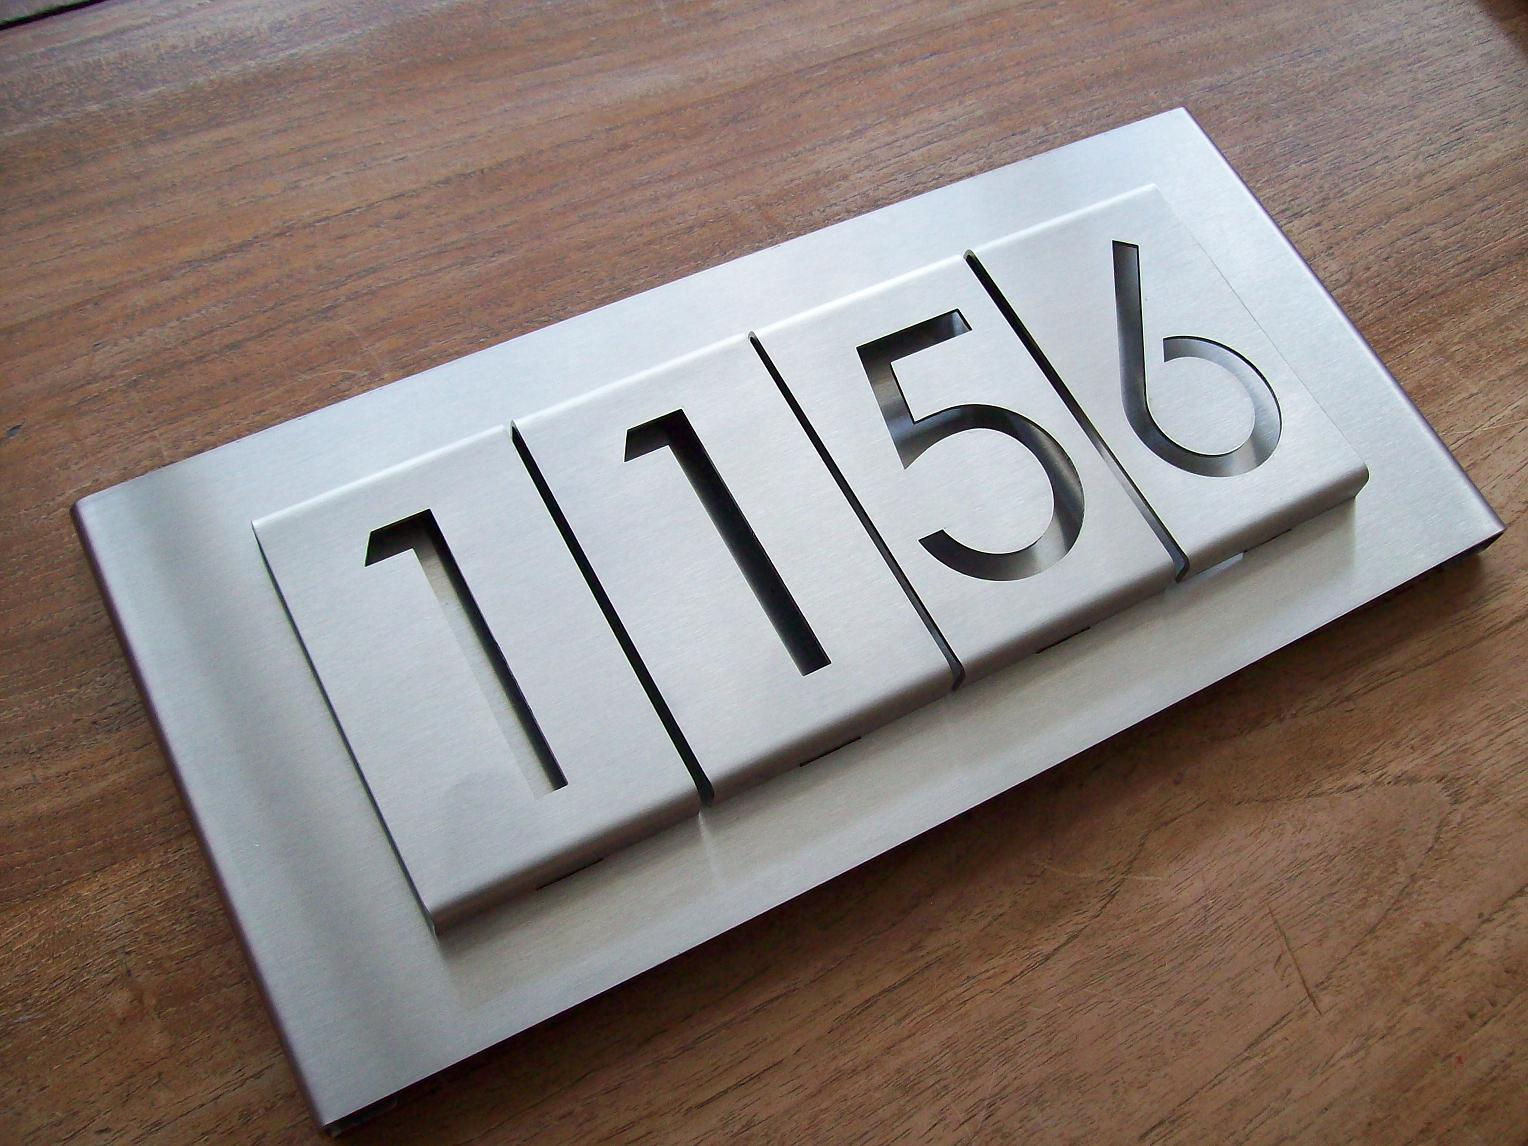 Huisnummer uit losse cijfers rvs316 3mm dik for Huisnummerbord maken